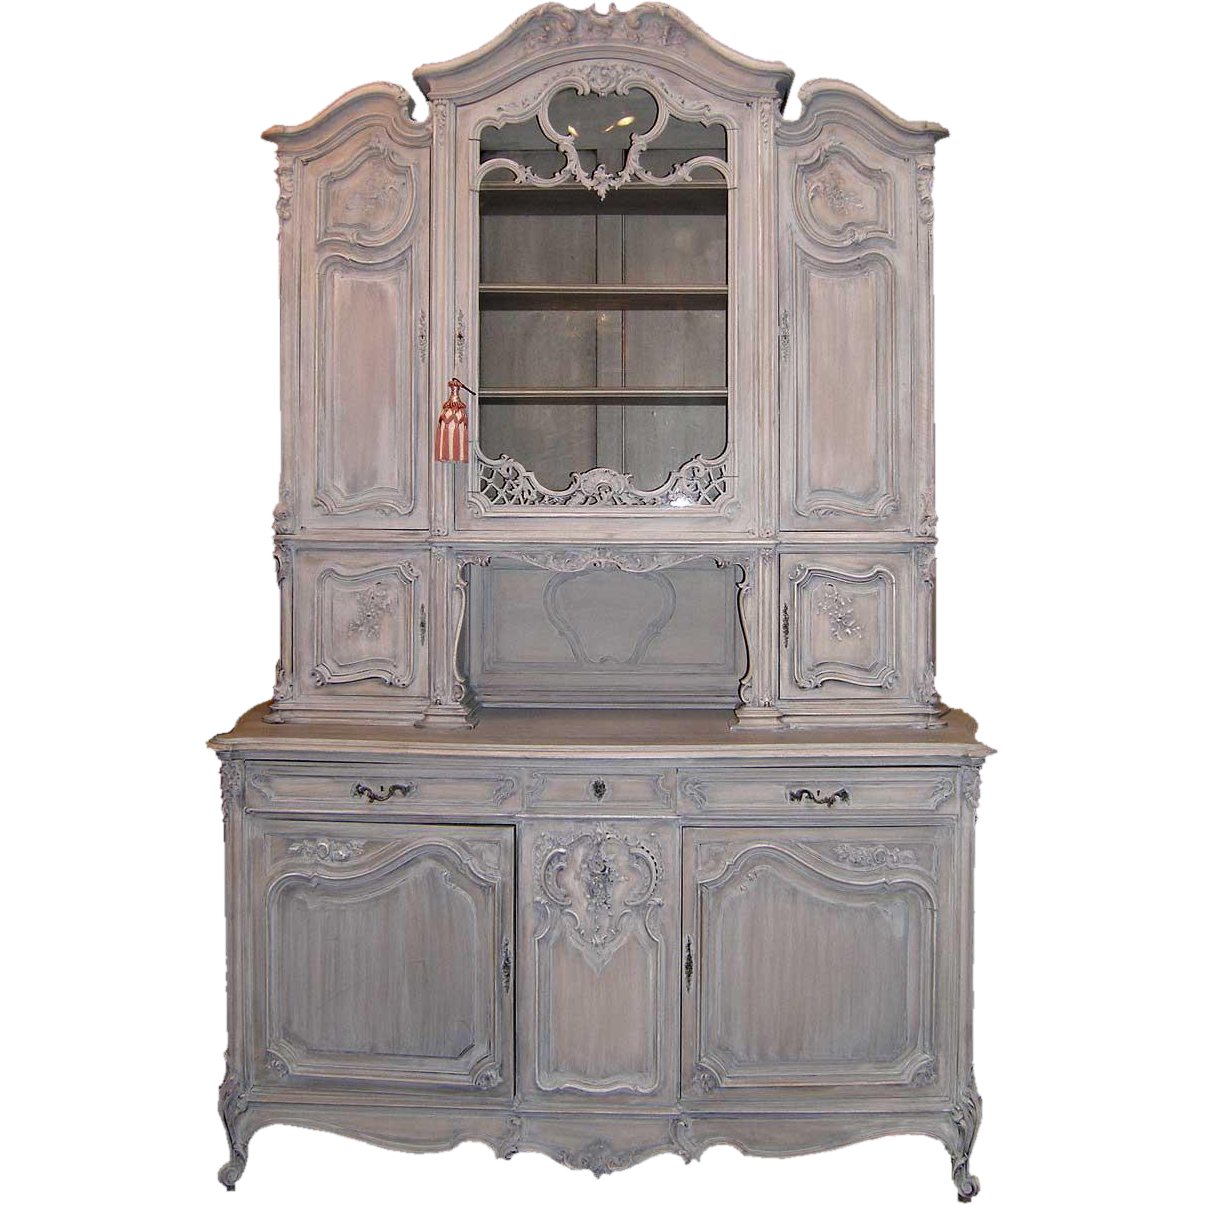 French Louis XV Style White Washed Walnut Three Part Buffet Shoprubylux EronJohnsonAntiques Dining TableDining